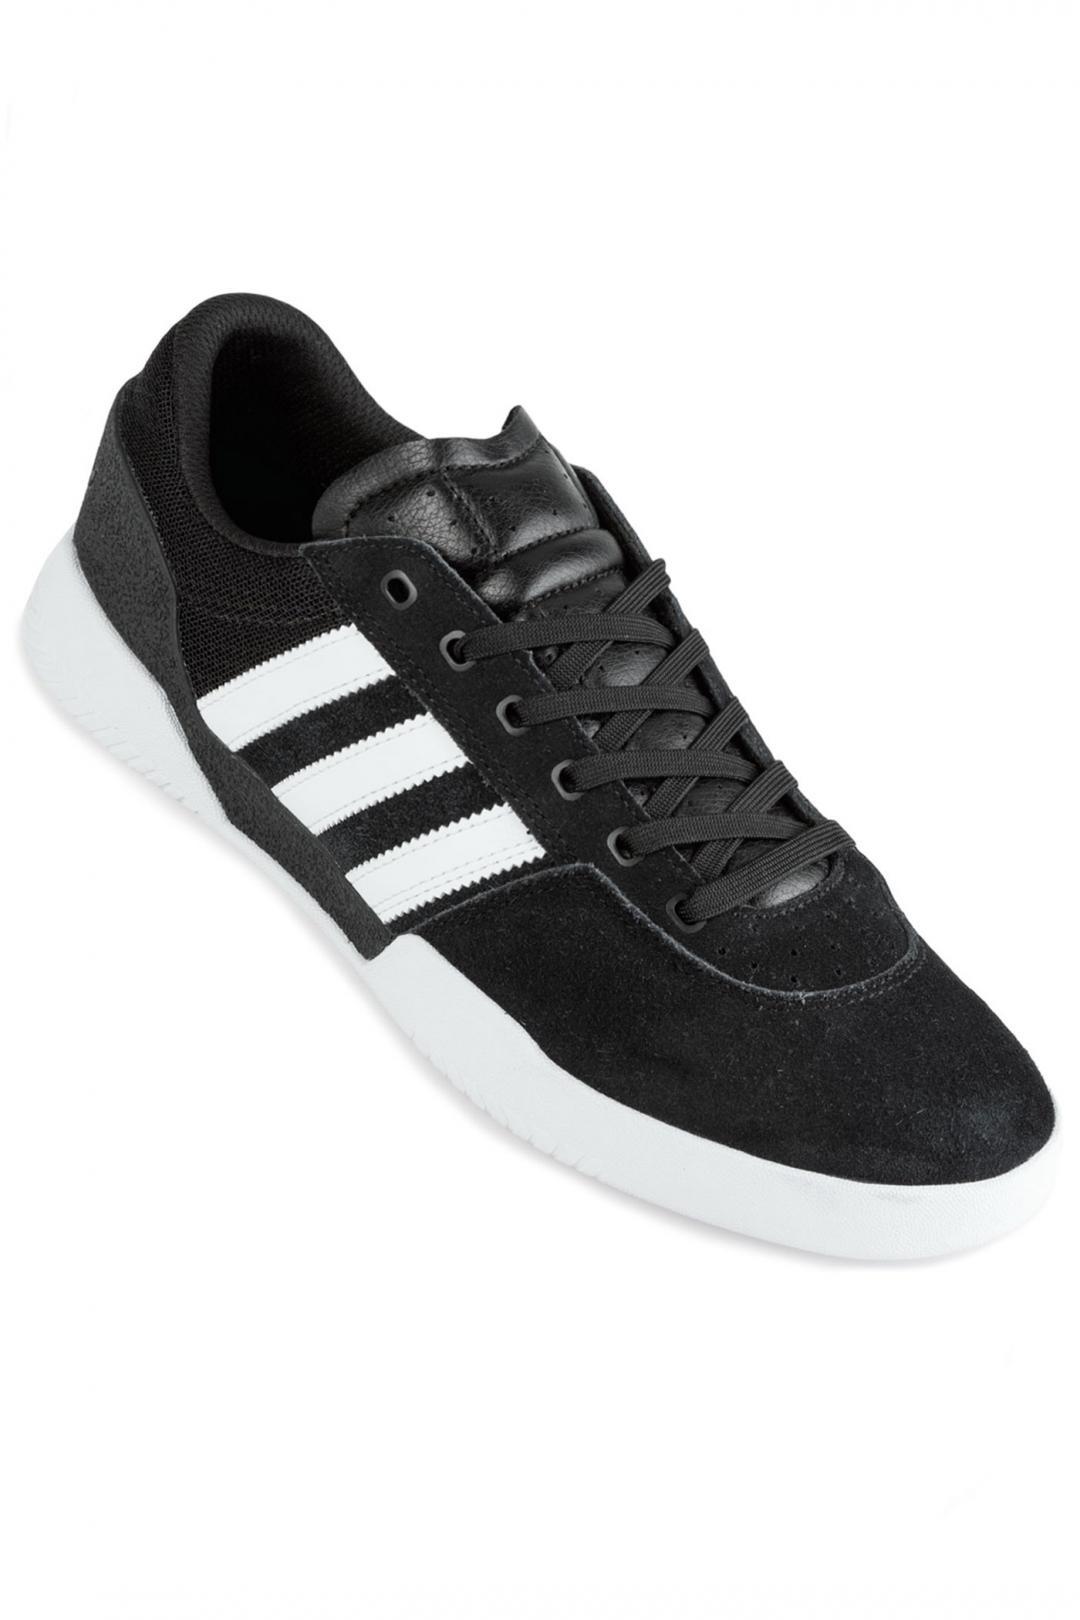 Uomo adidas Skateboarding City Cup core black white white | Scarpe da skate